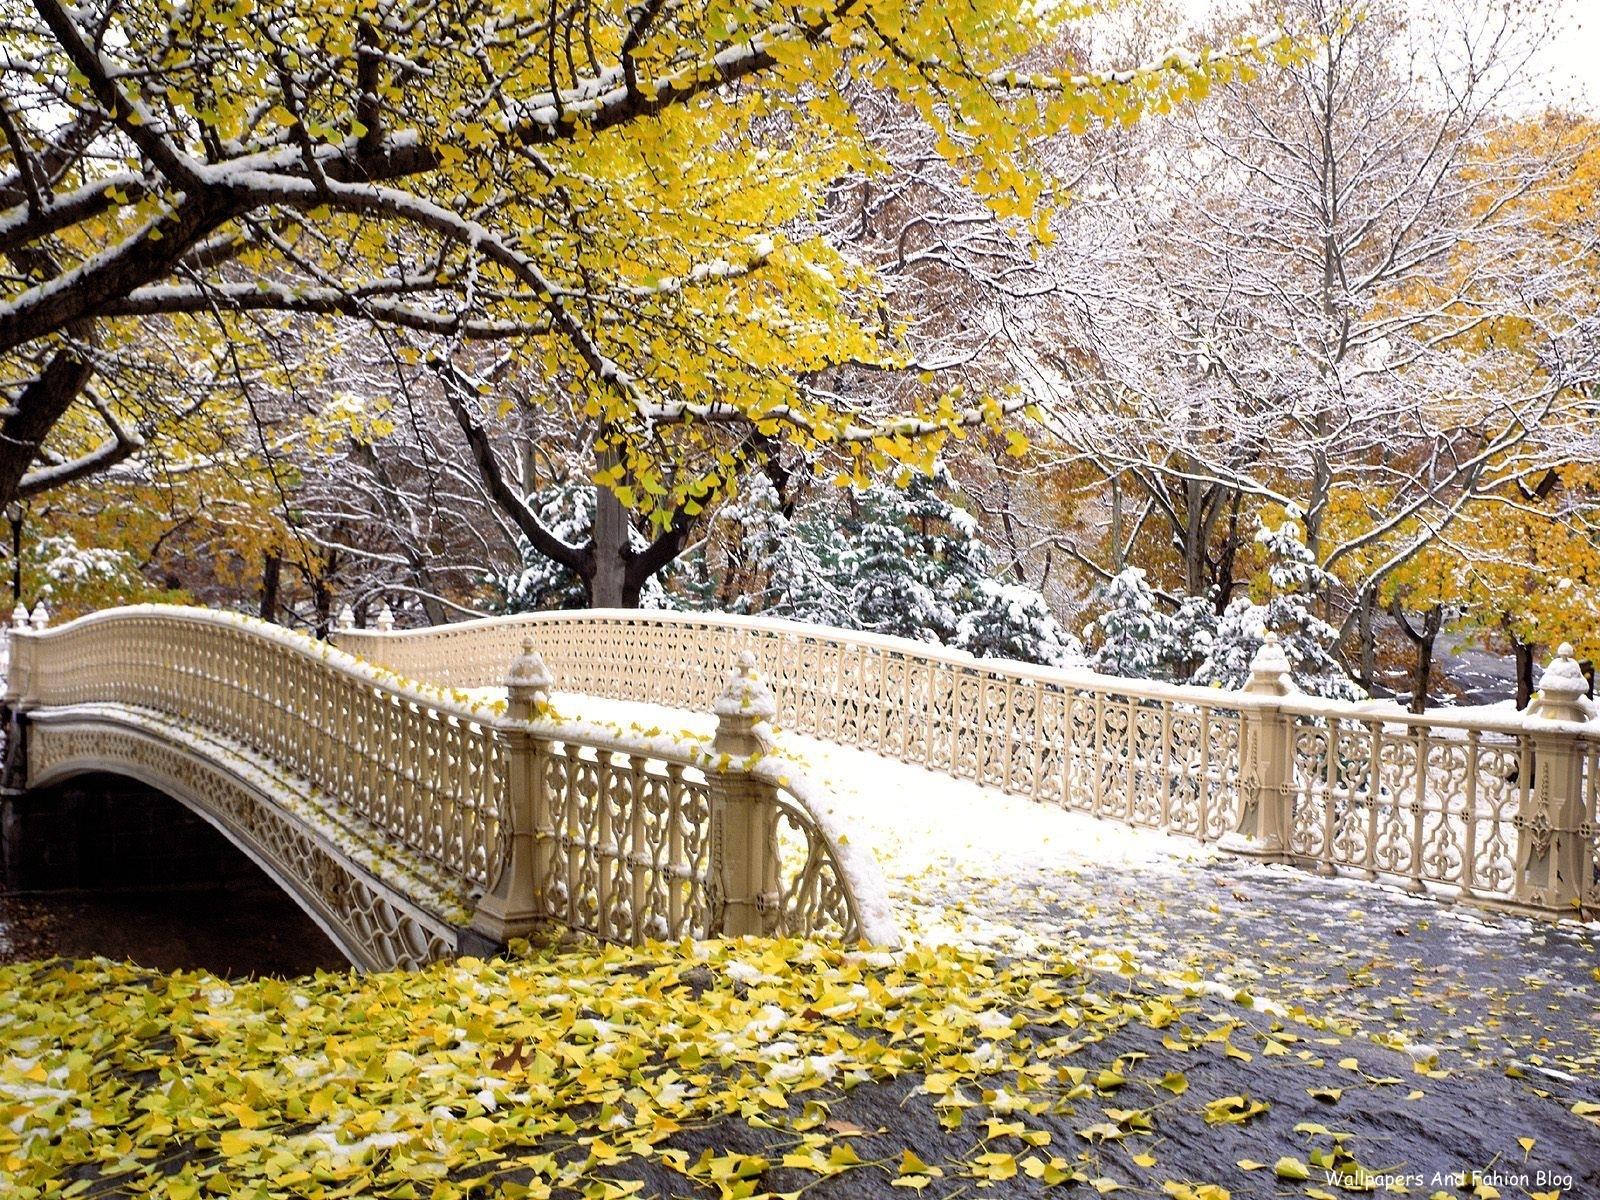 http://1.bp.blogspot.com/-nR2C95Zo_VI/Tpi6MBNd3hI/AAAAAAAAClw/sAbE1QrYDSI/s1600/bridge_autumn_wallpaper.jpg